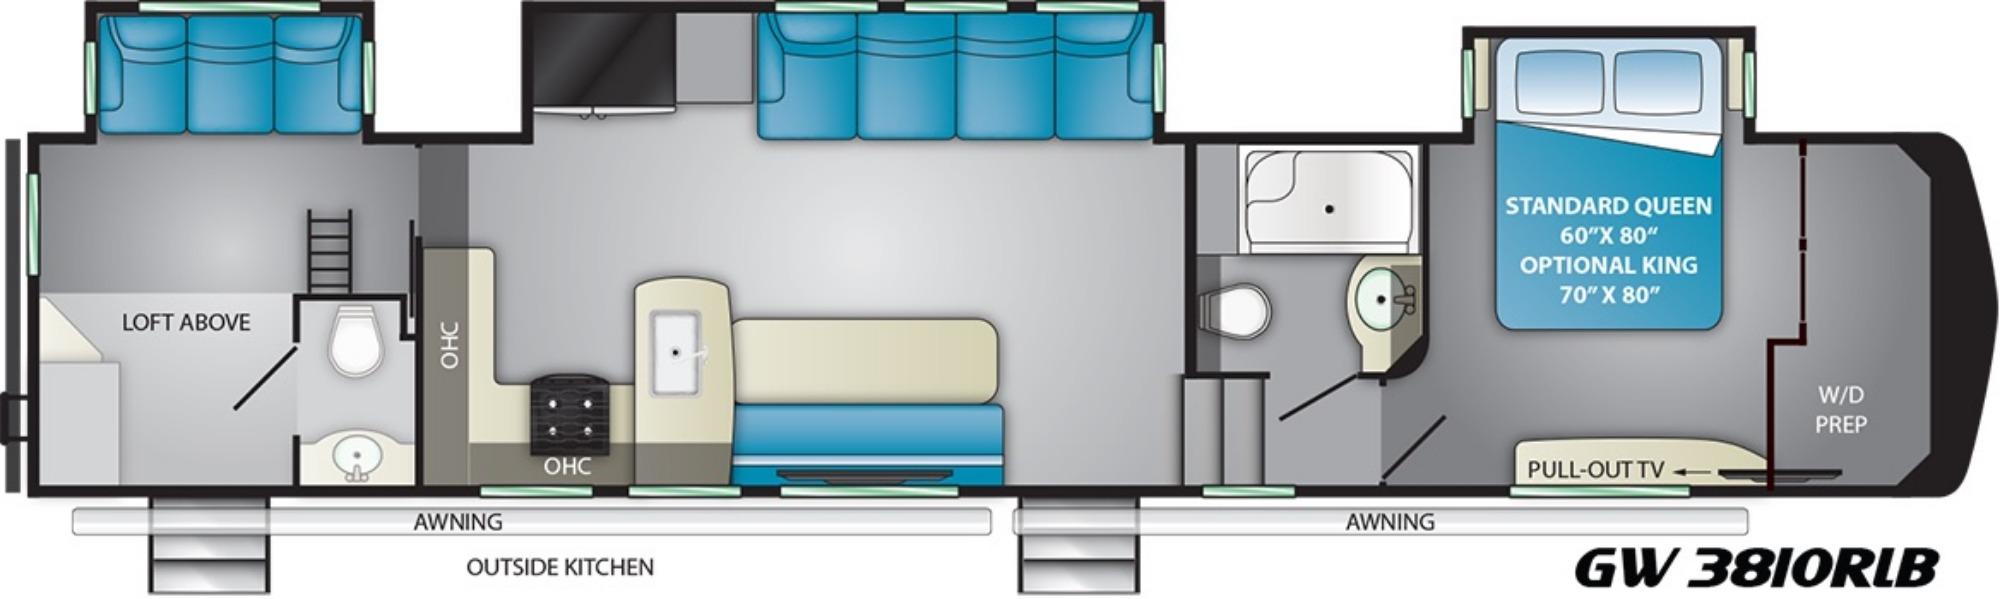 View Floor Plan for 2019 HEARTLAND GATEWAY 3810RLB